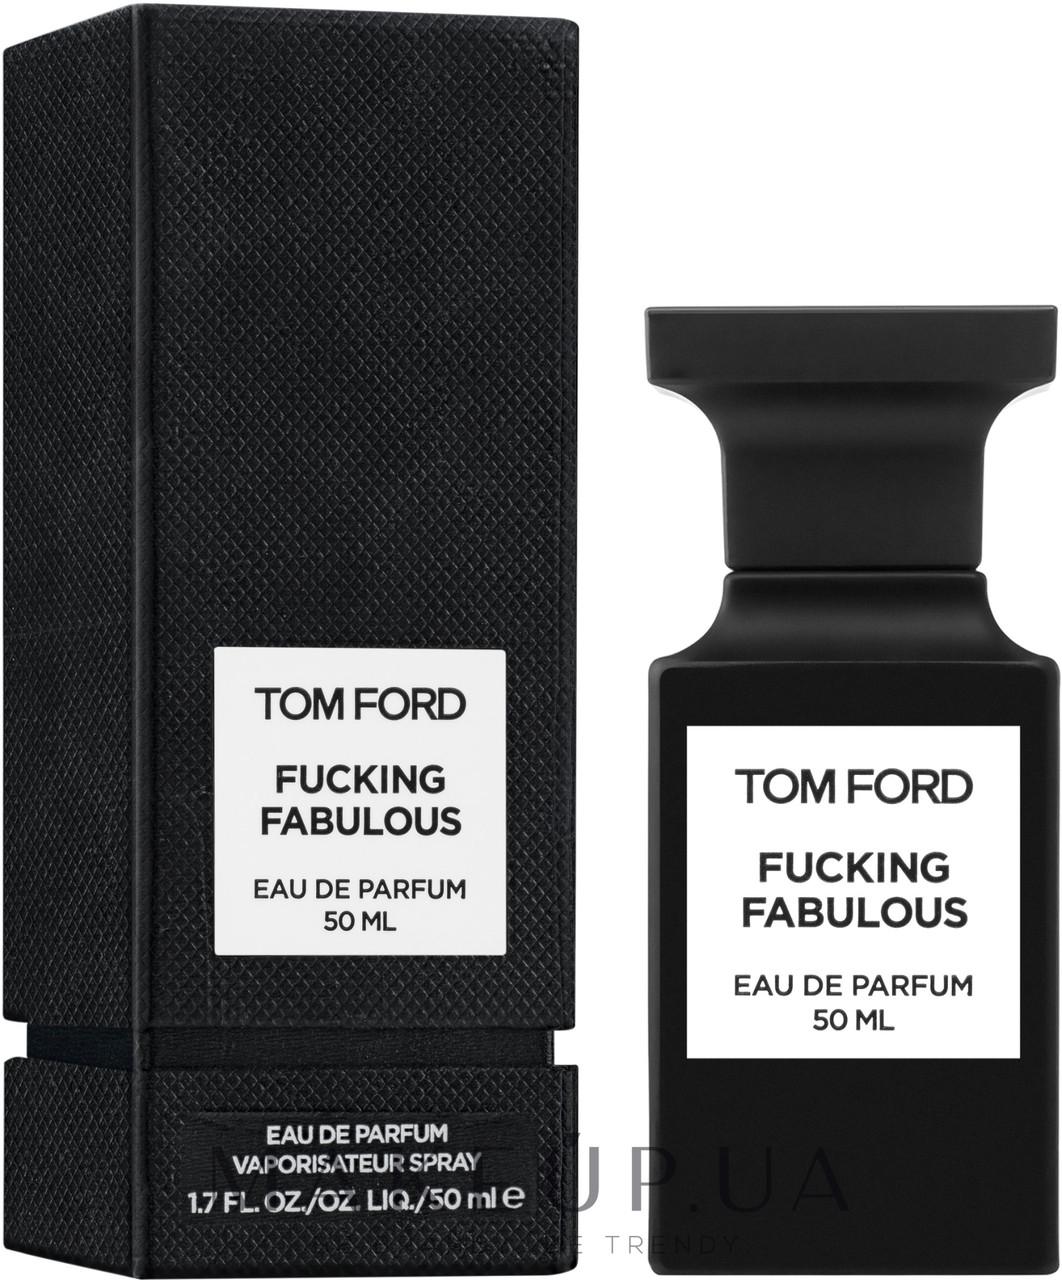 Оригинал унисекс парфюмированная вода Tom Ford Fabulous